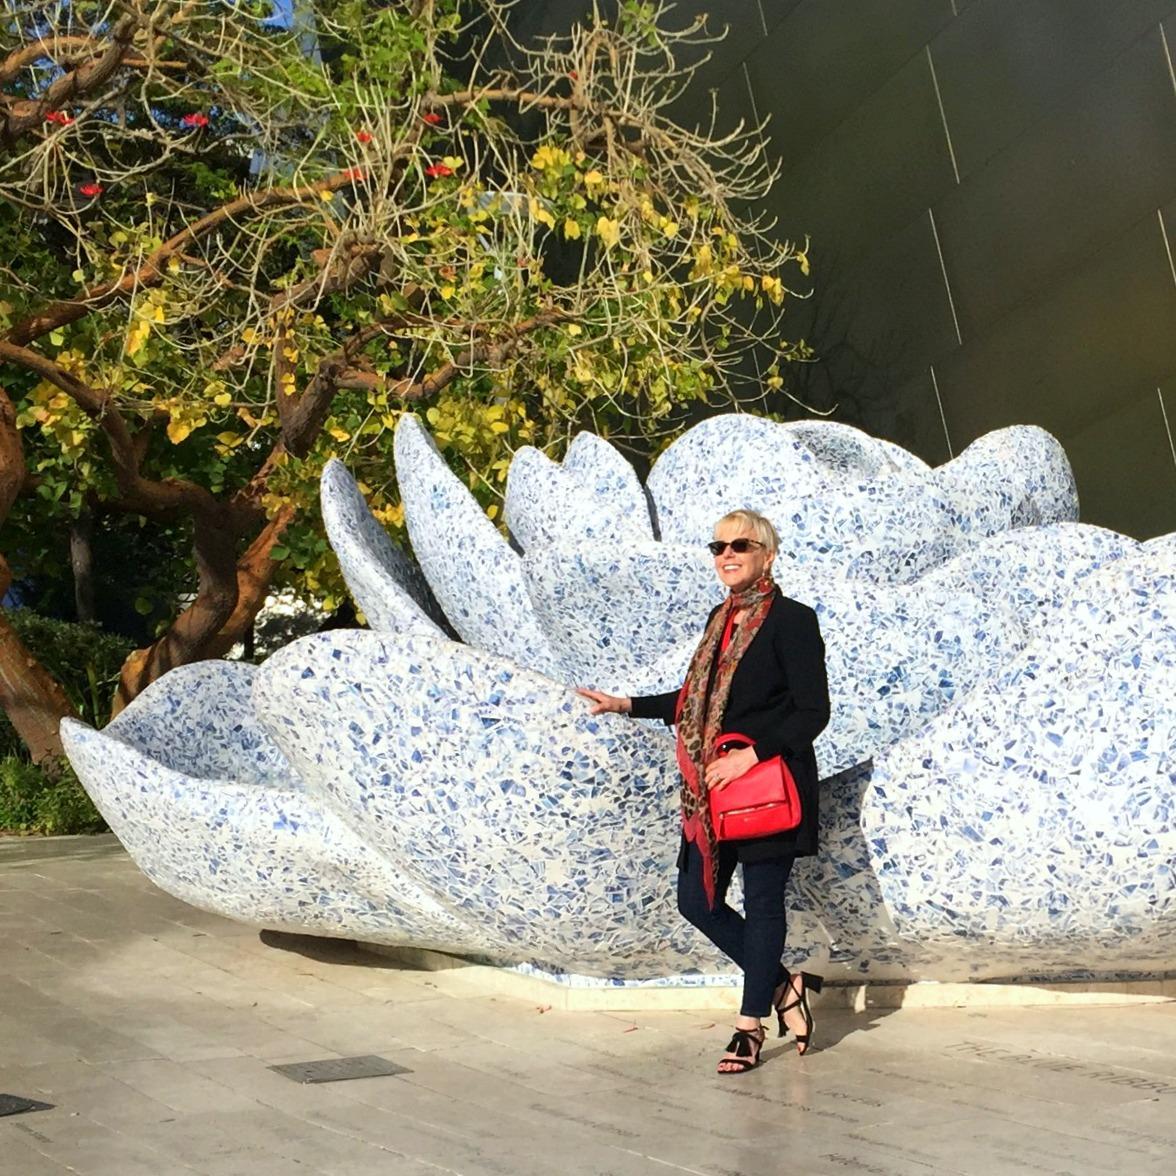 Givenchy Pandora Pure, Stuart Weitzman sandals